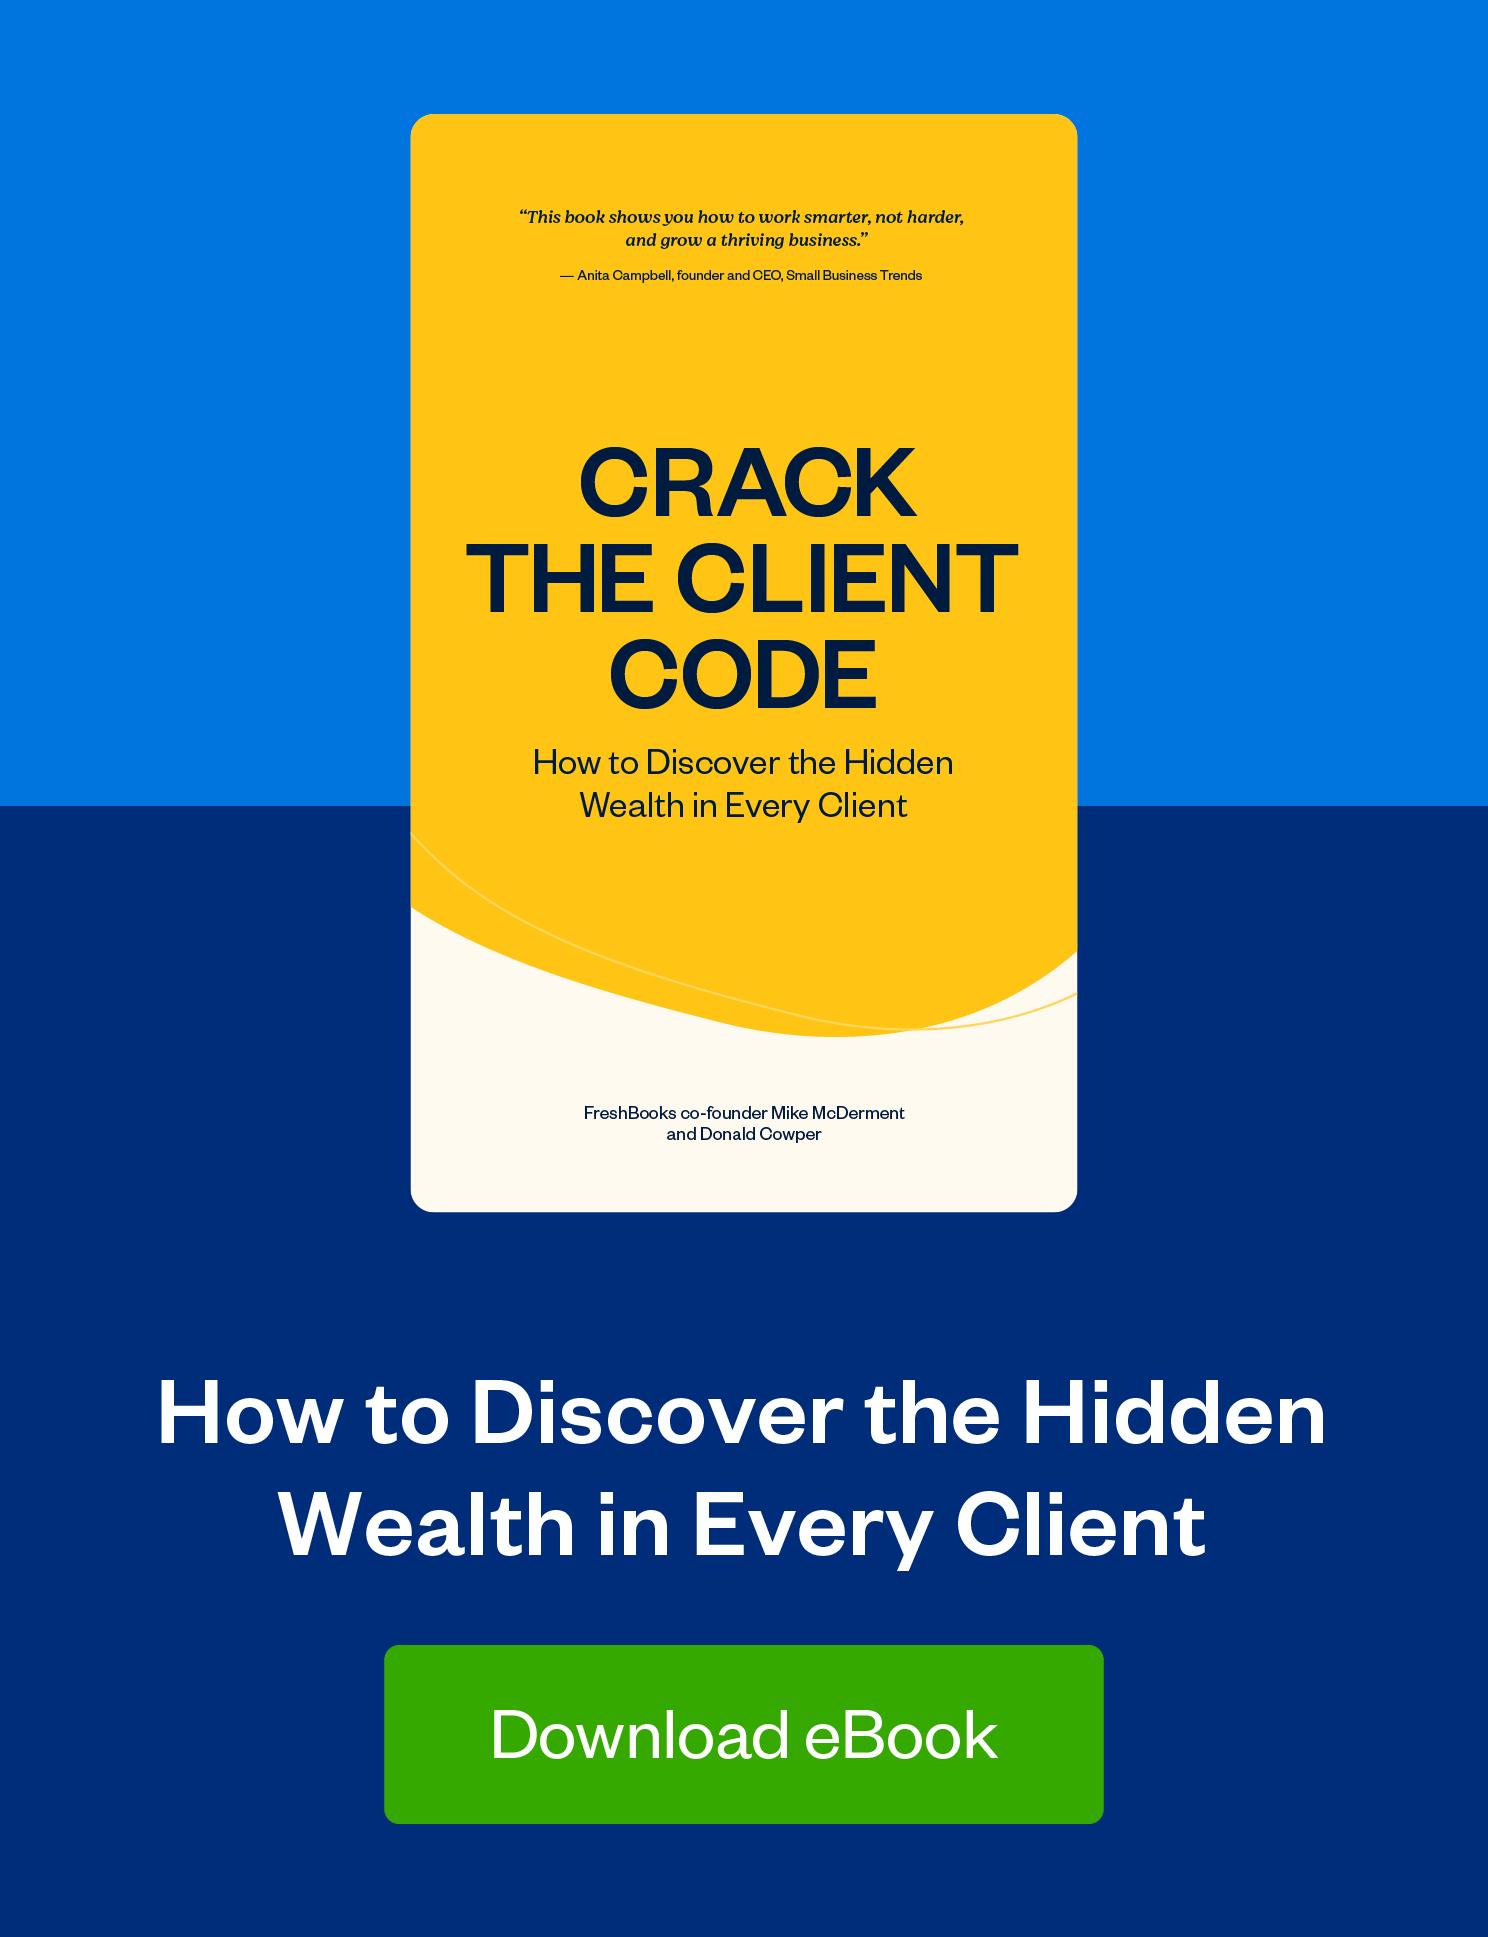 crack the client code ebook ad